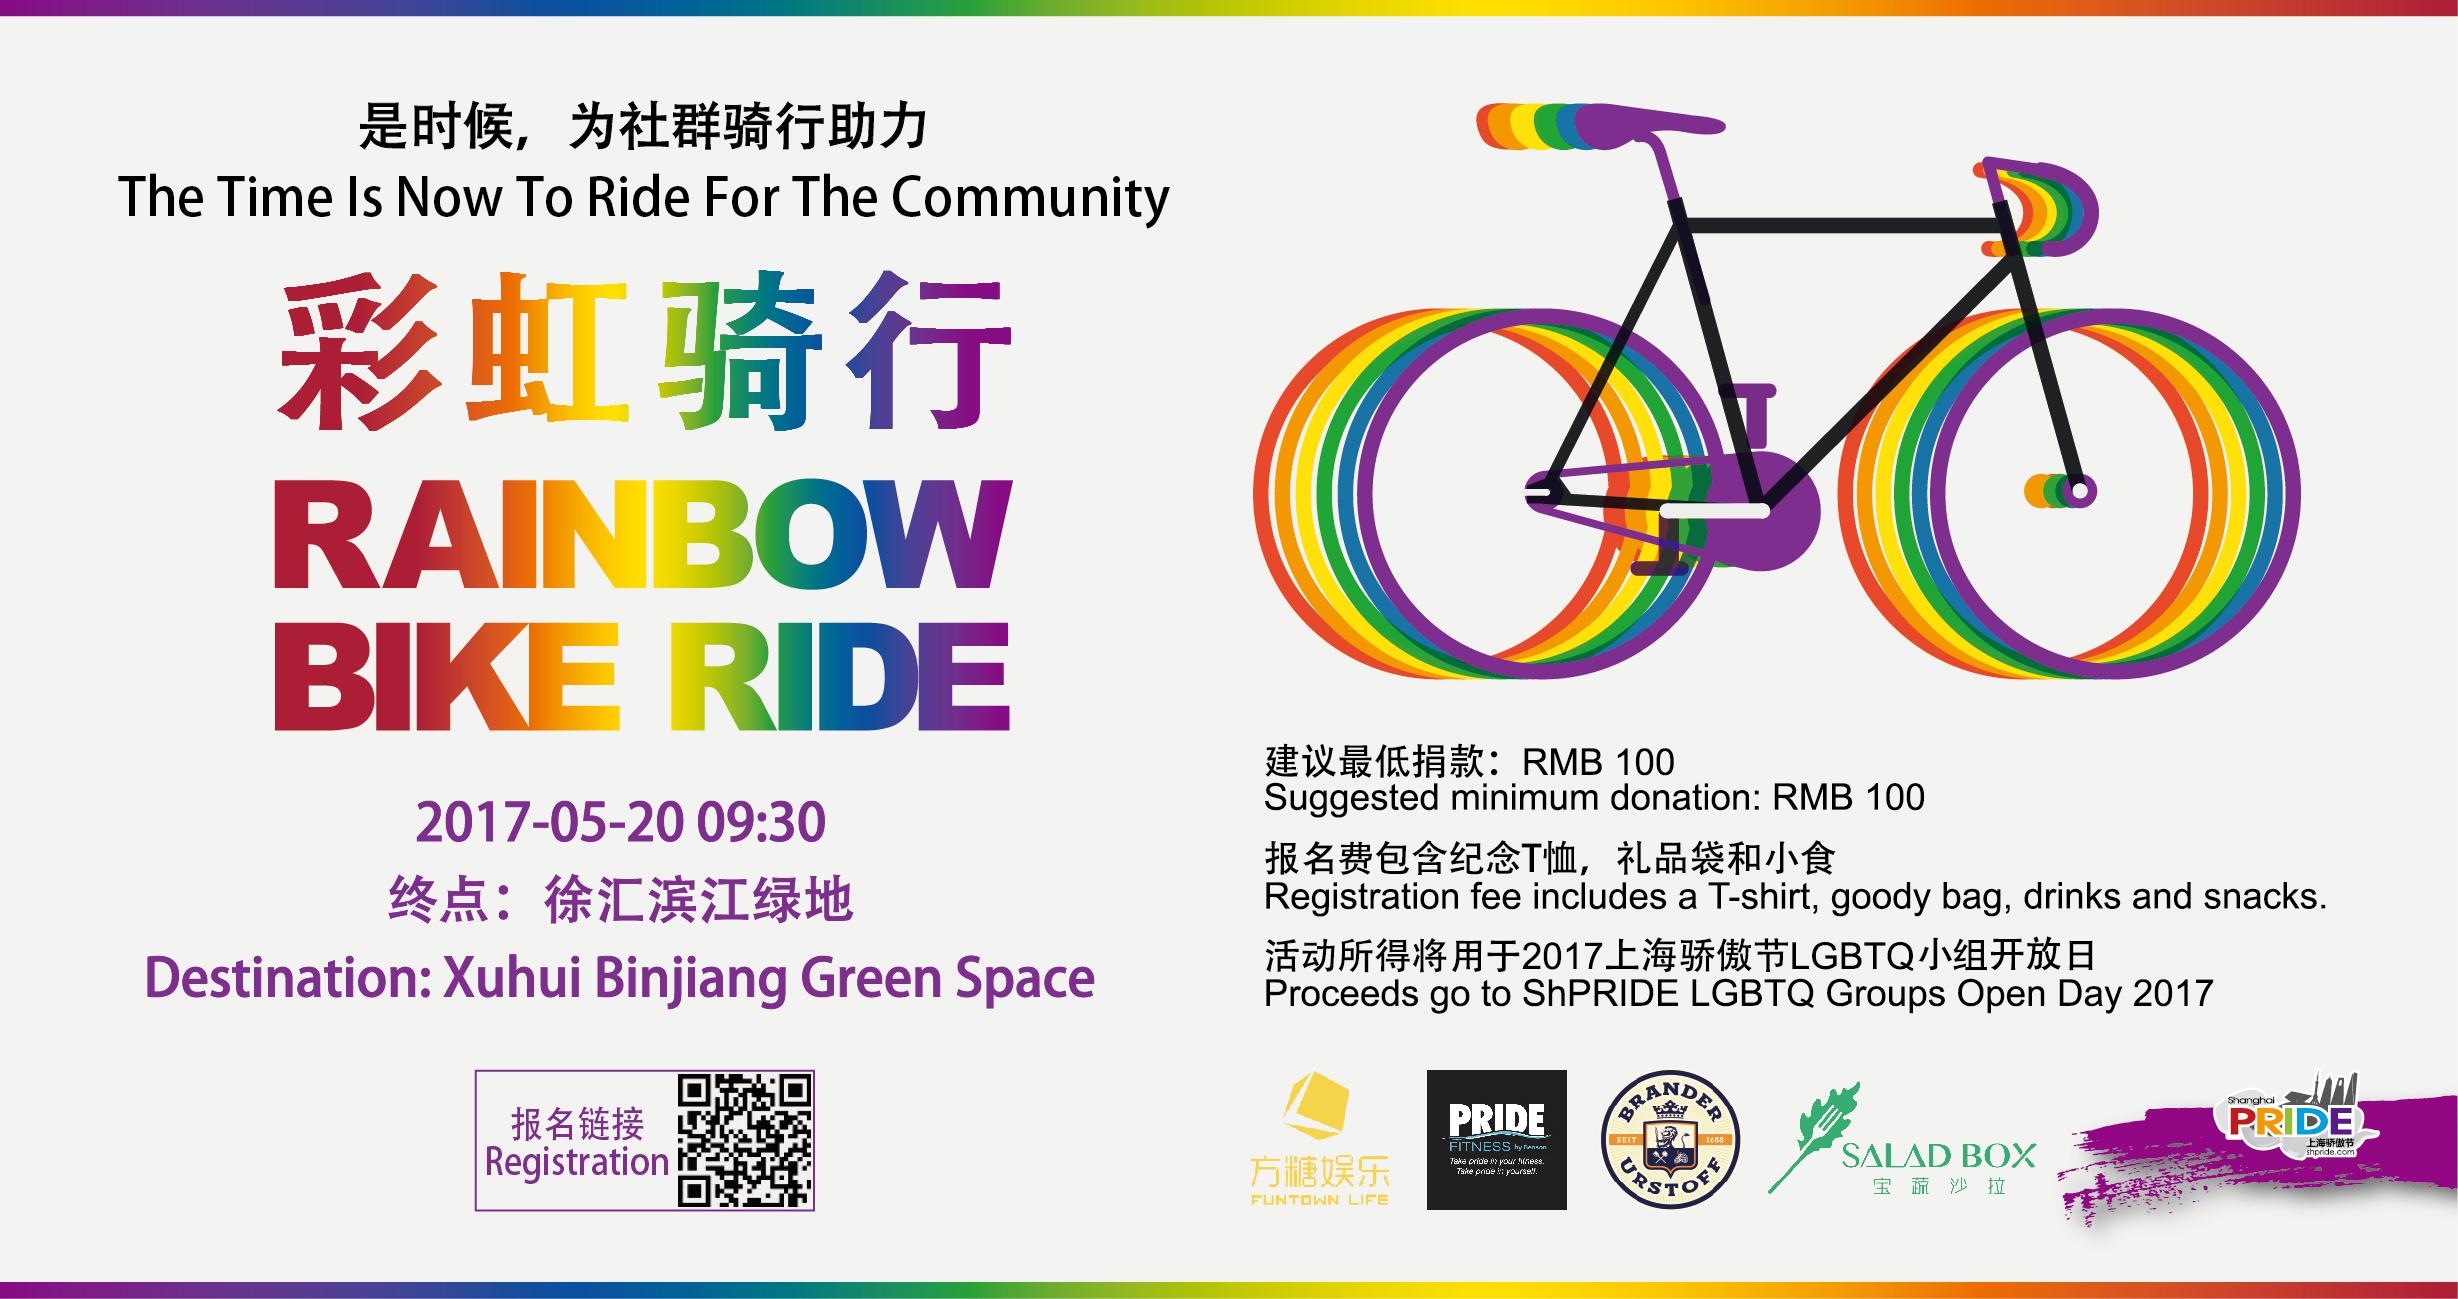 RainbowBikeRide-02